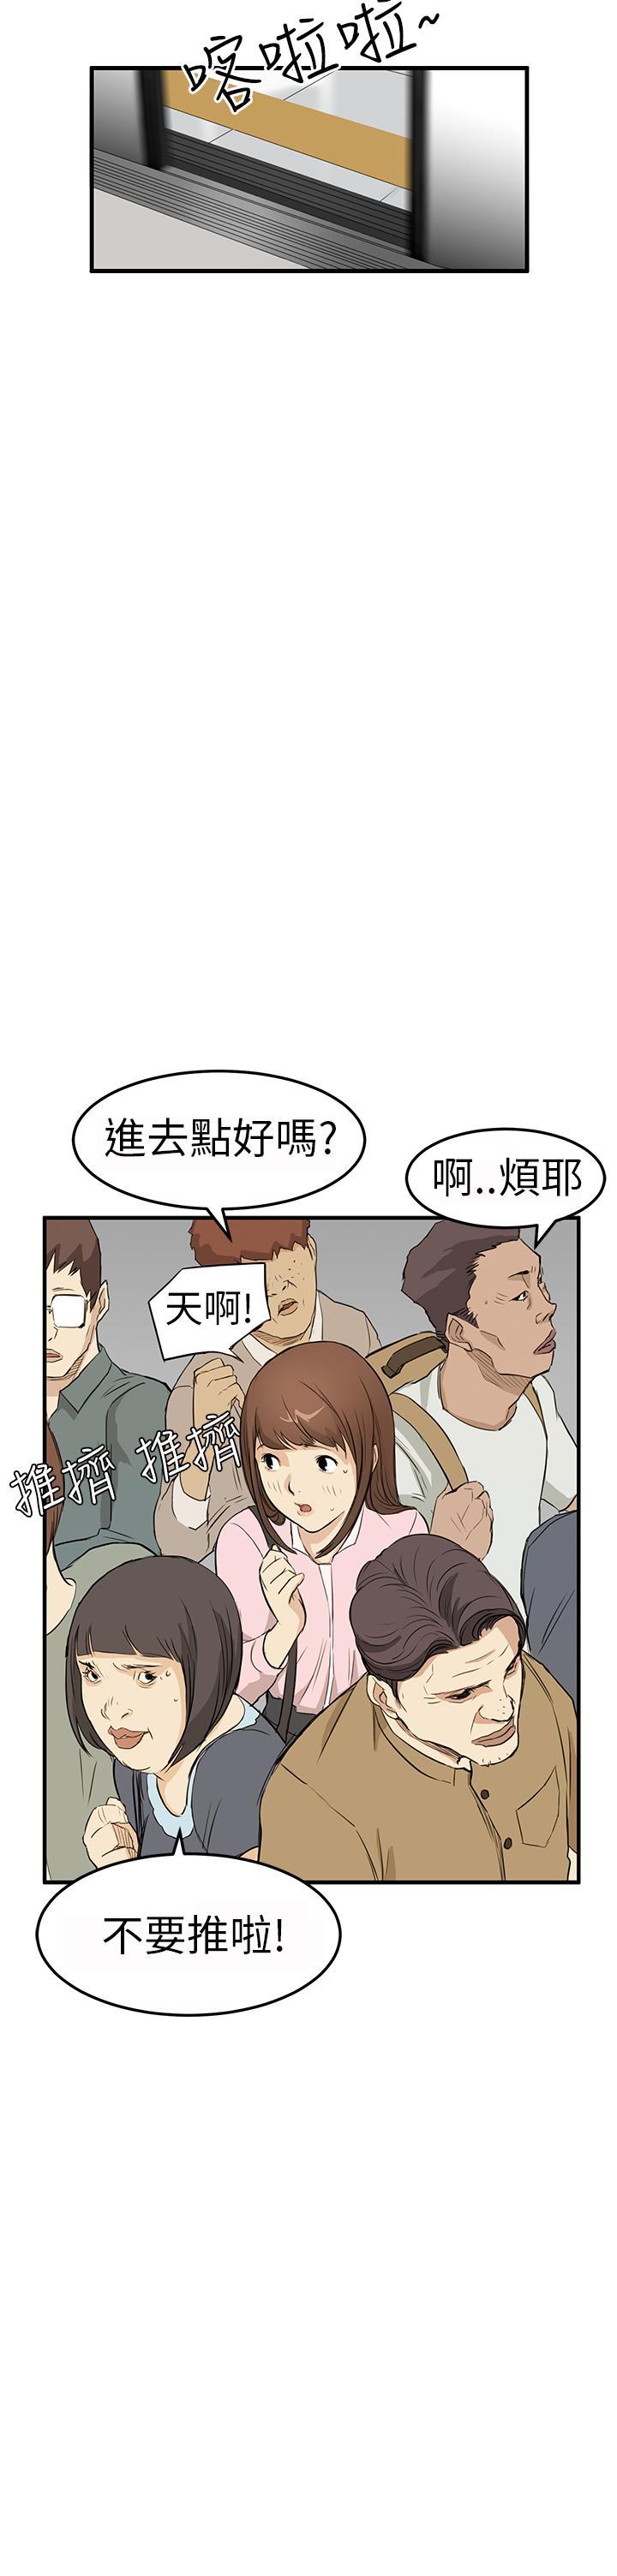 Si-Eun 诗恩 Ch.1~5 75